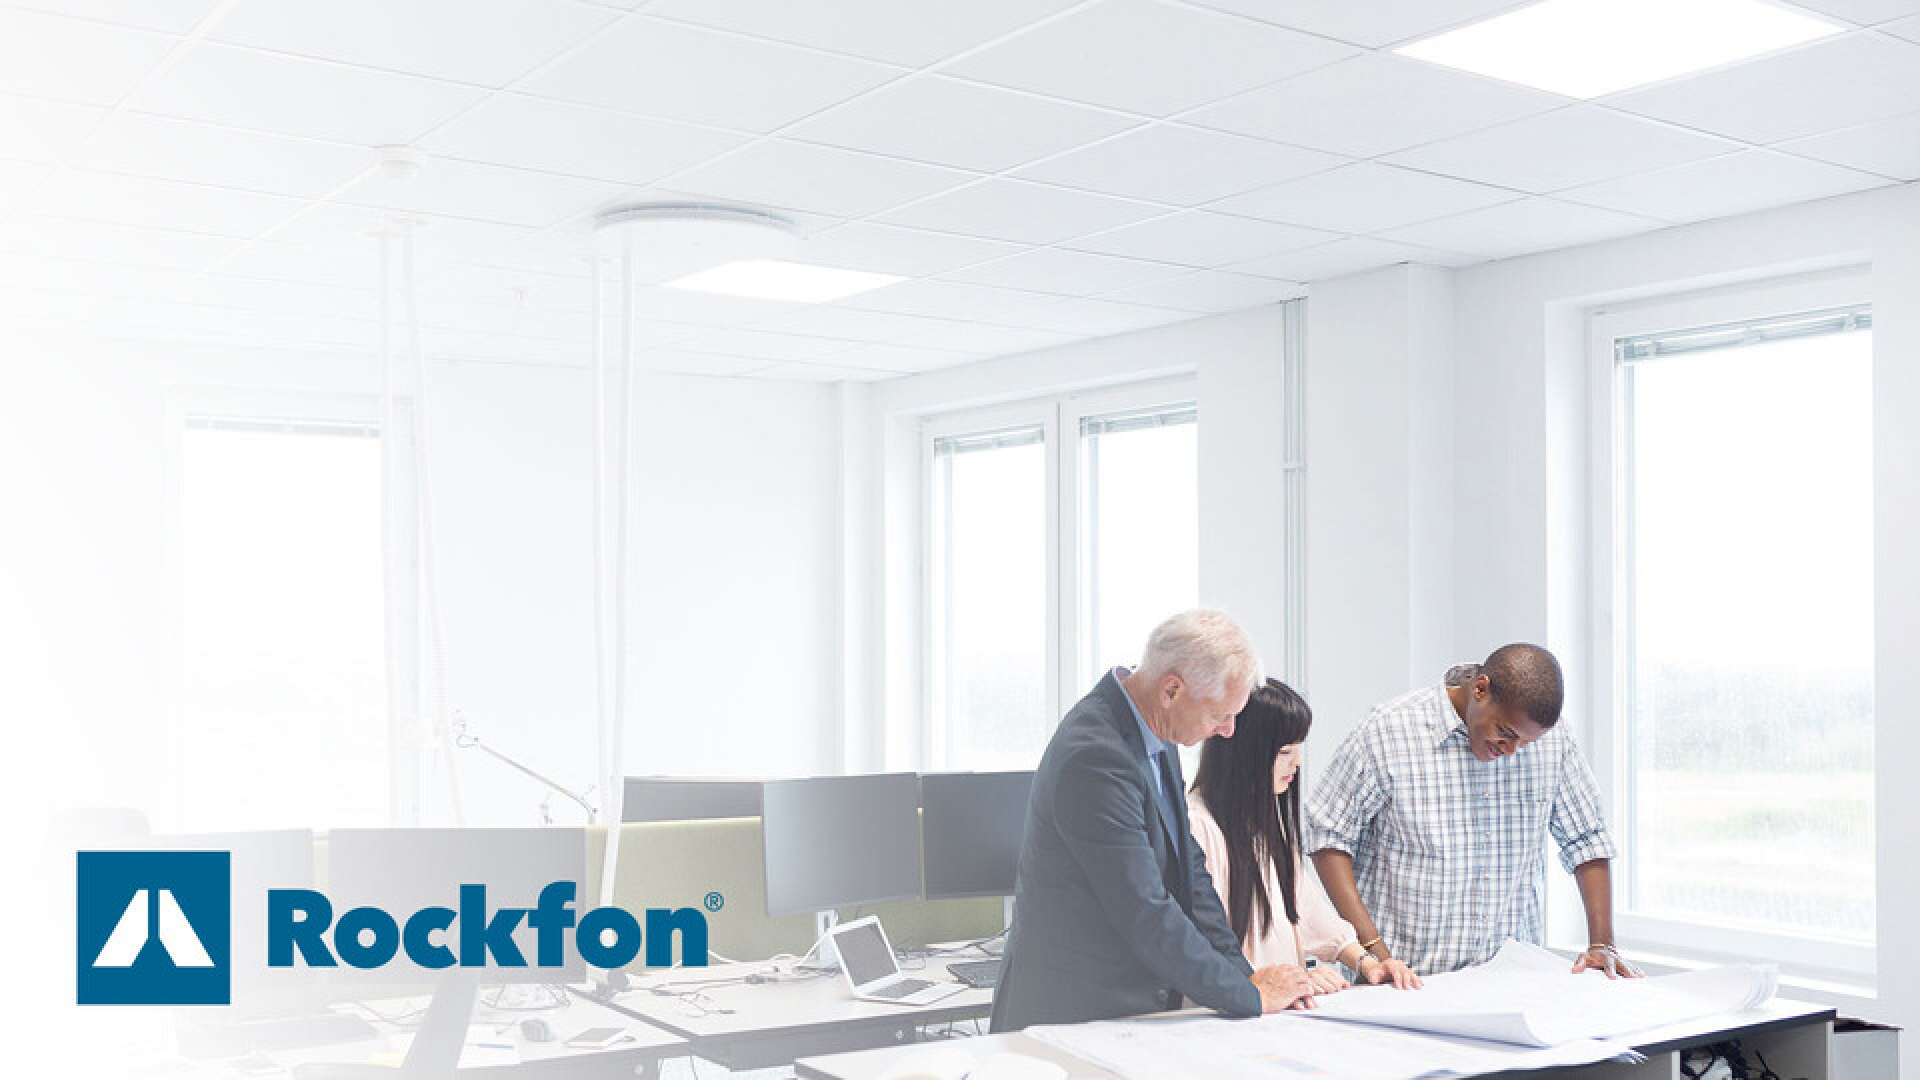 Branded image, human resources, vacancies, jobs, Rockfon